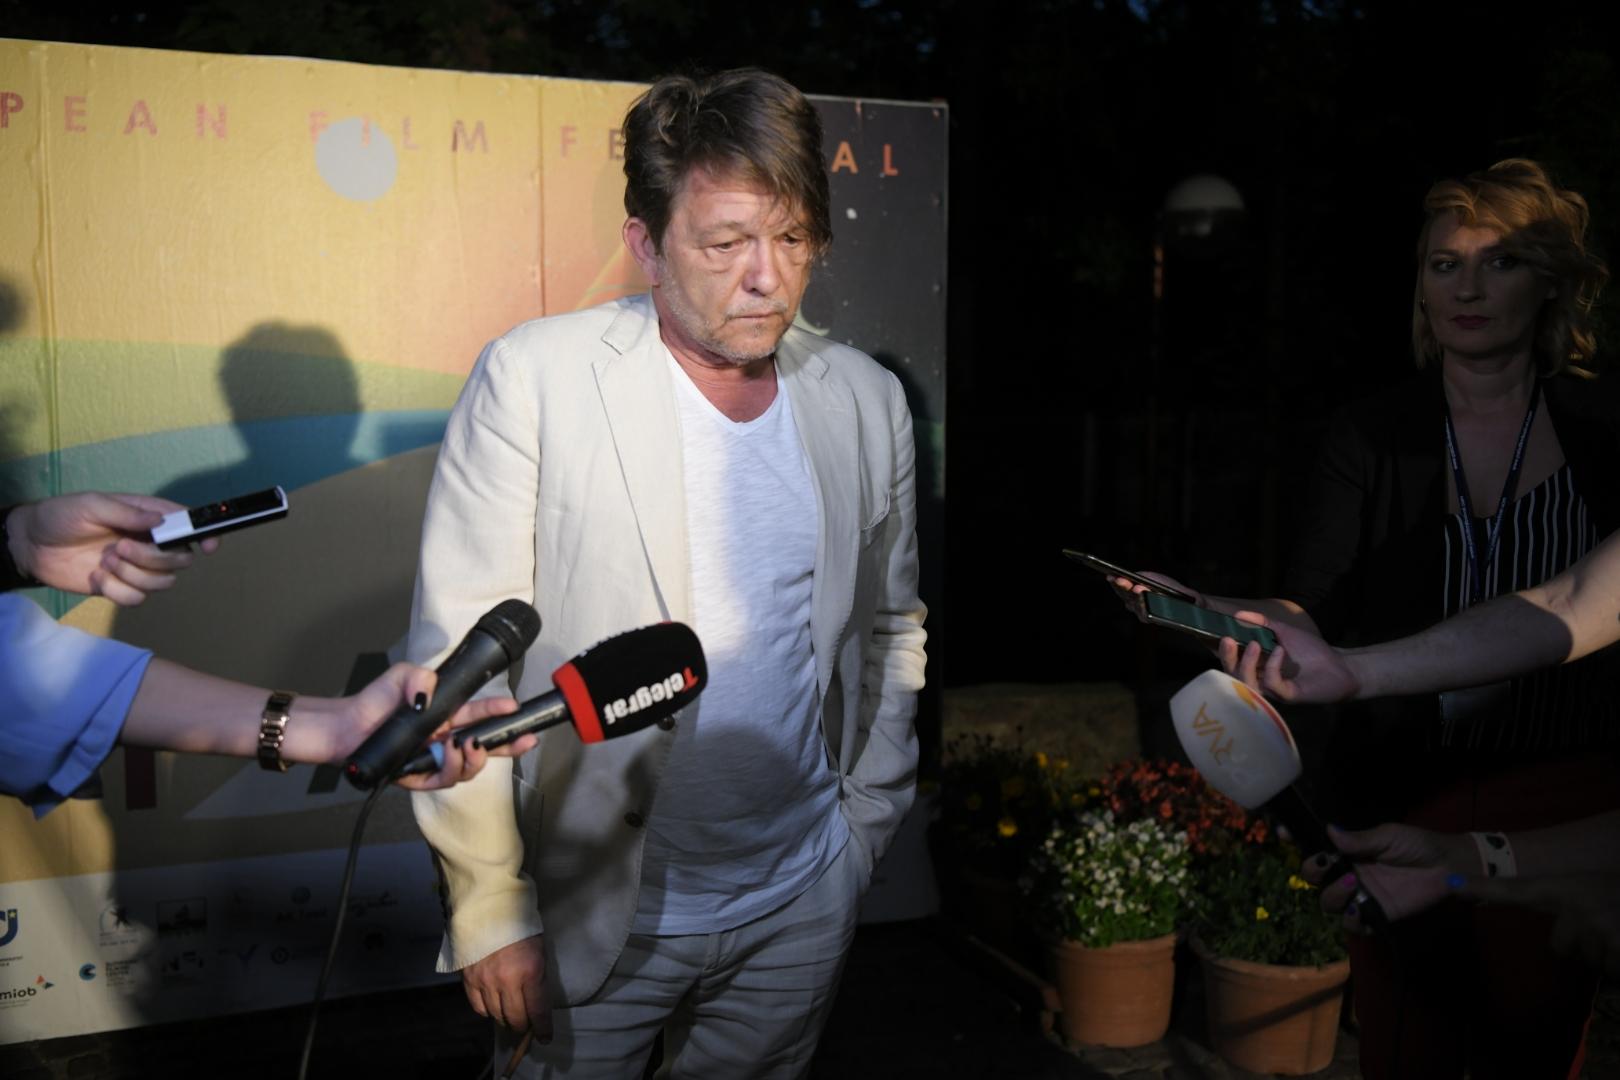 Festival evropskog filma Palic Dragan Bjelogrlic